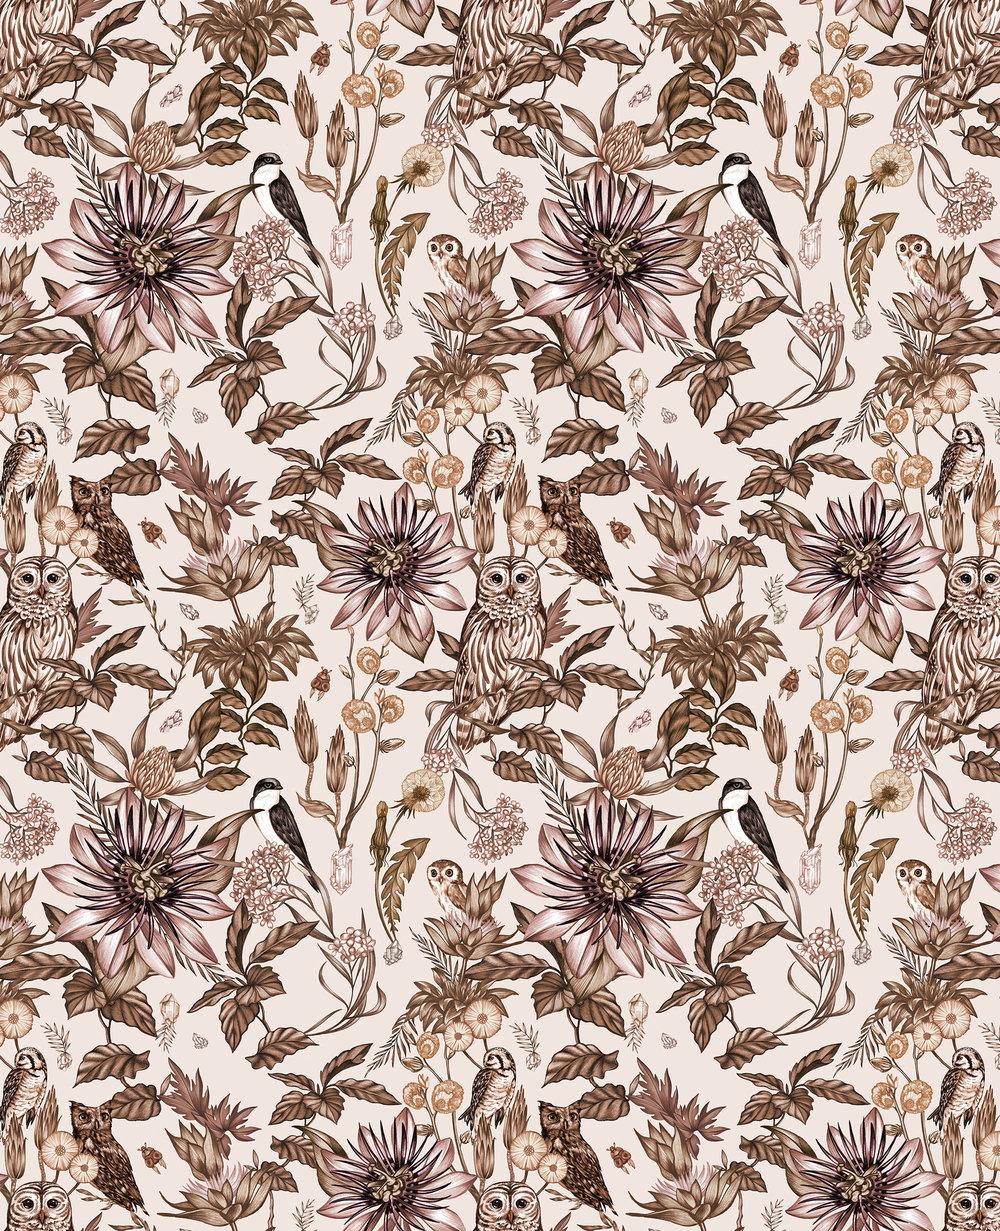 AOW_24x32_wallpaper_OwlCrystal.jpg